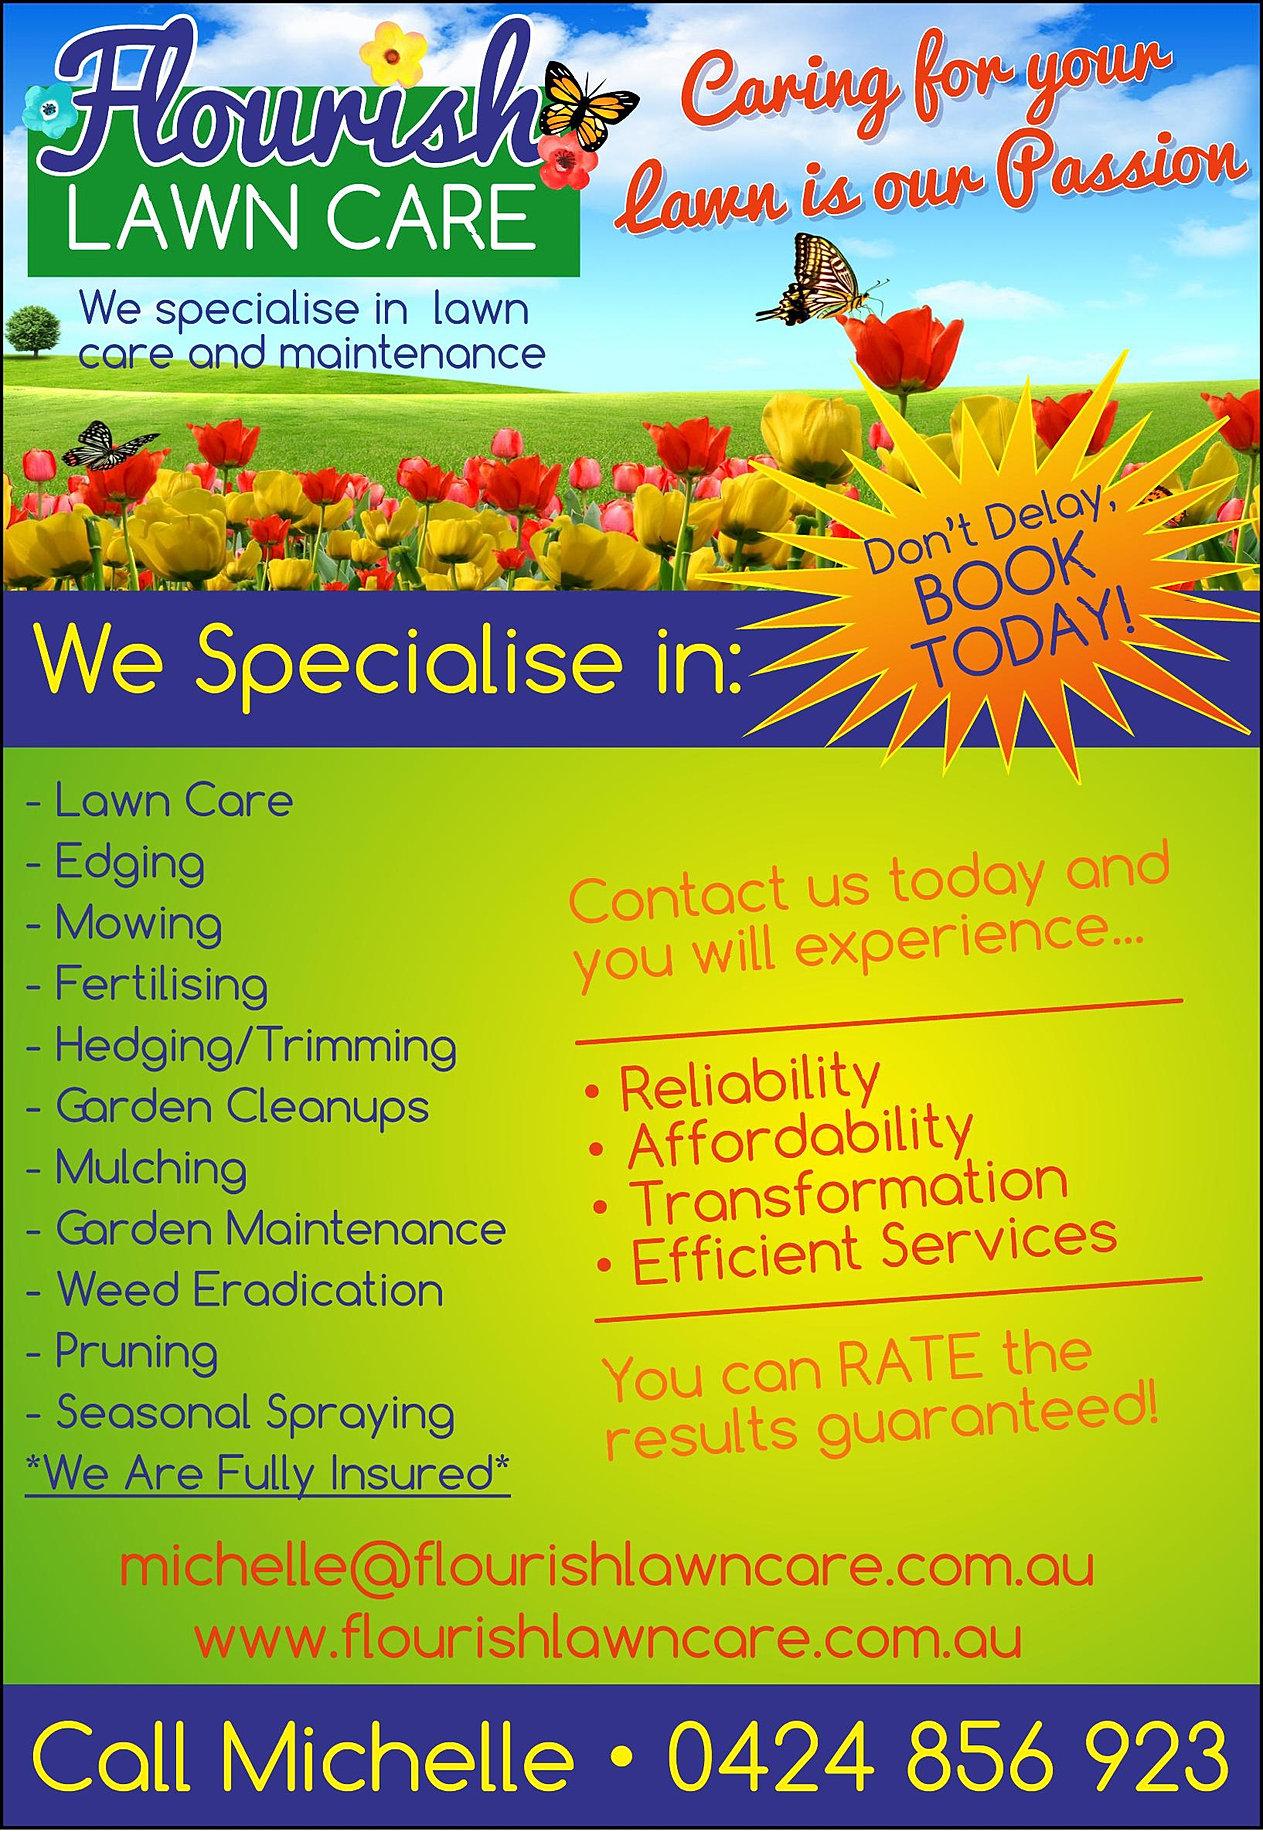 Flourishlawncare Specials